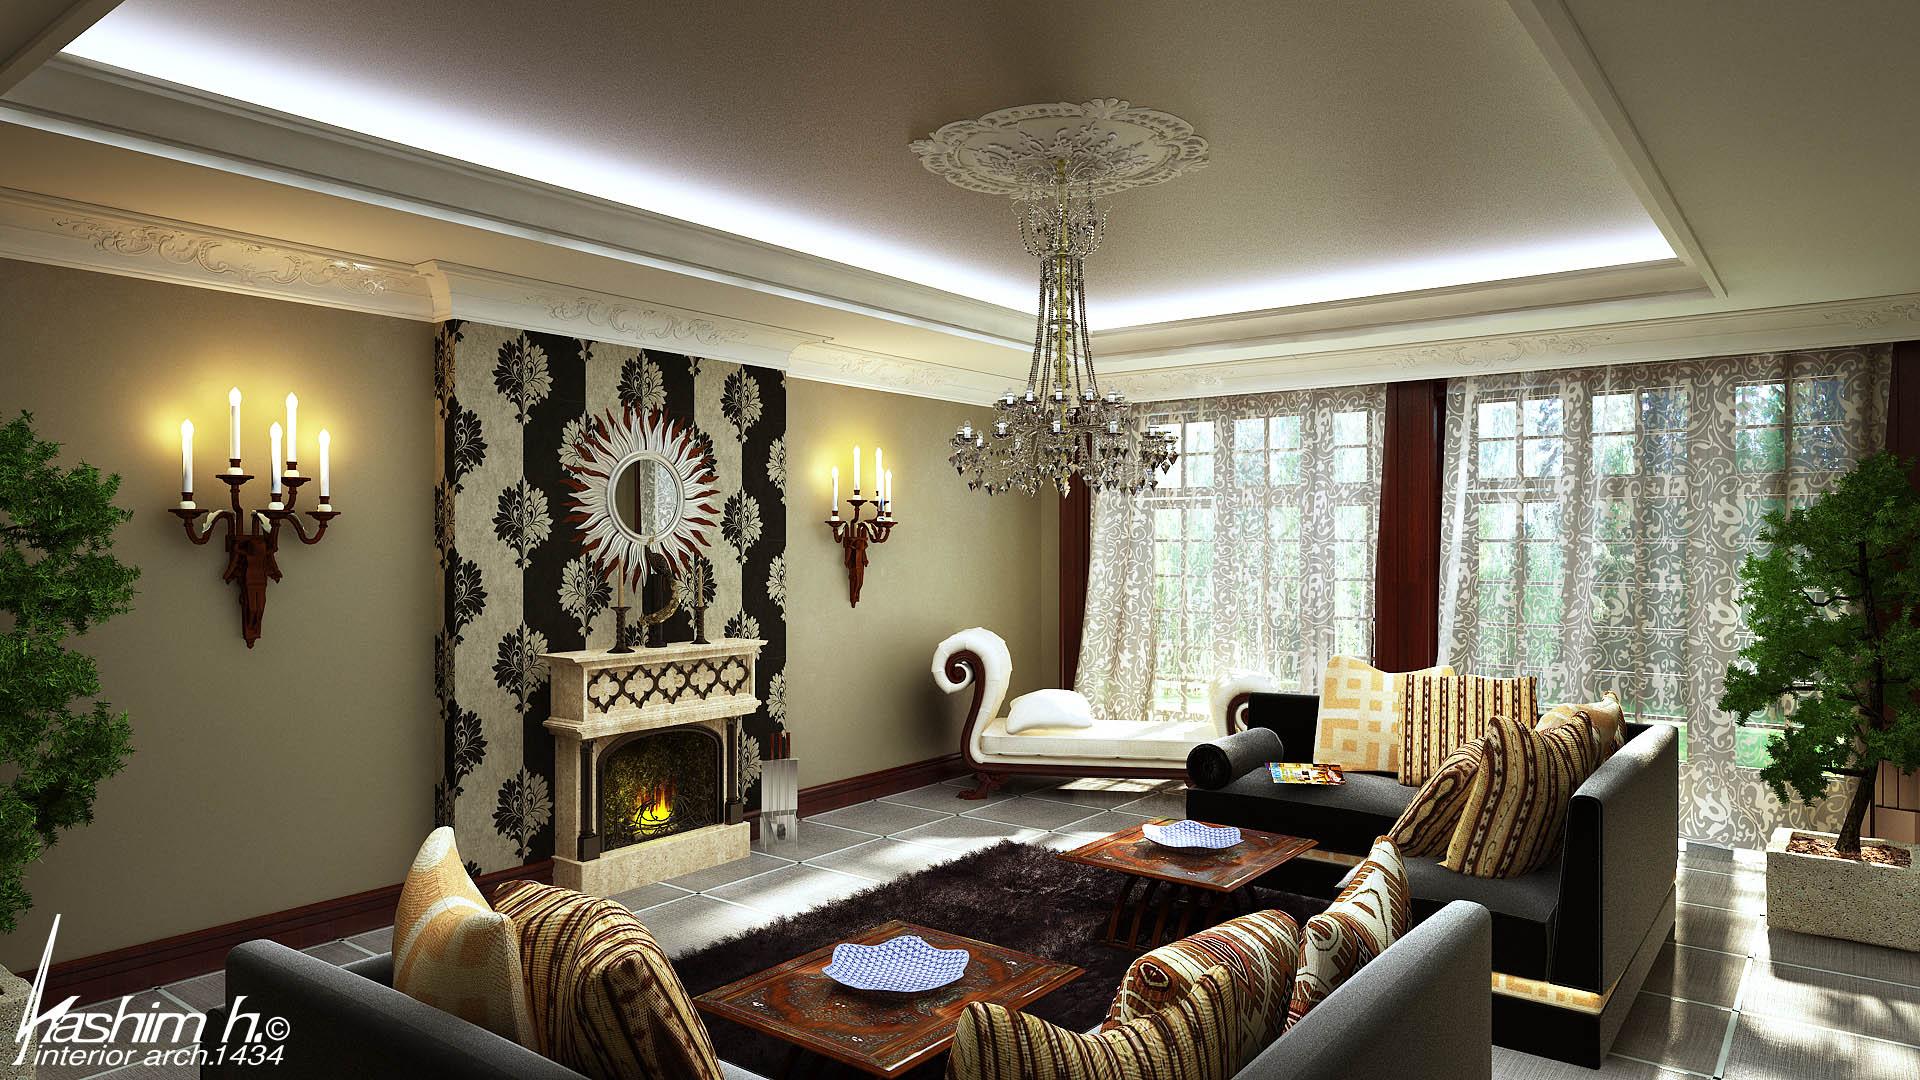 Symmetrical balance in interior design viewing gallery - Balance in interior design ...